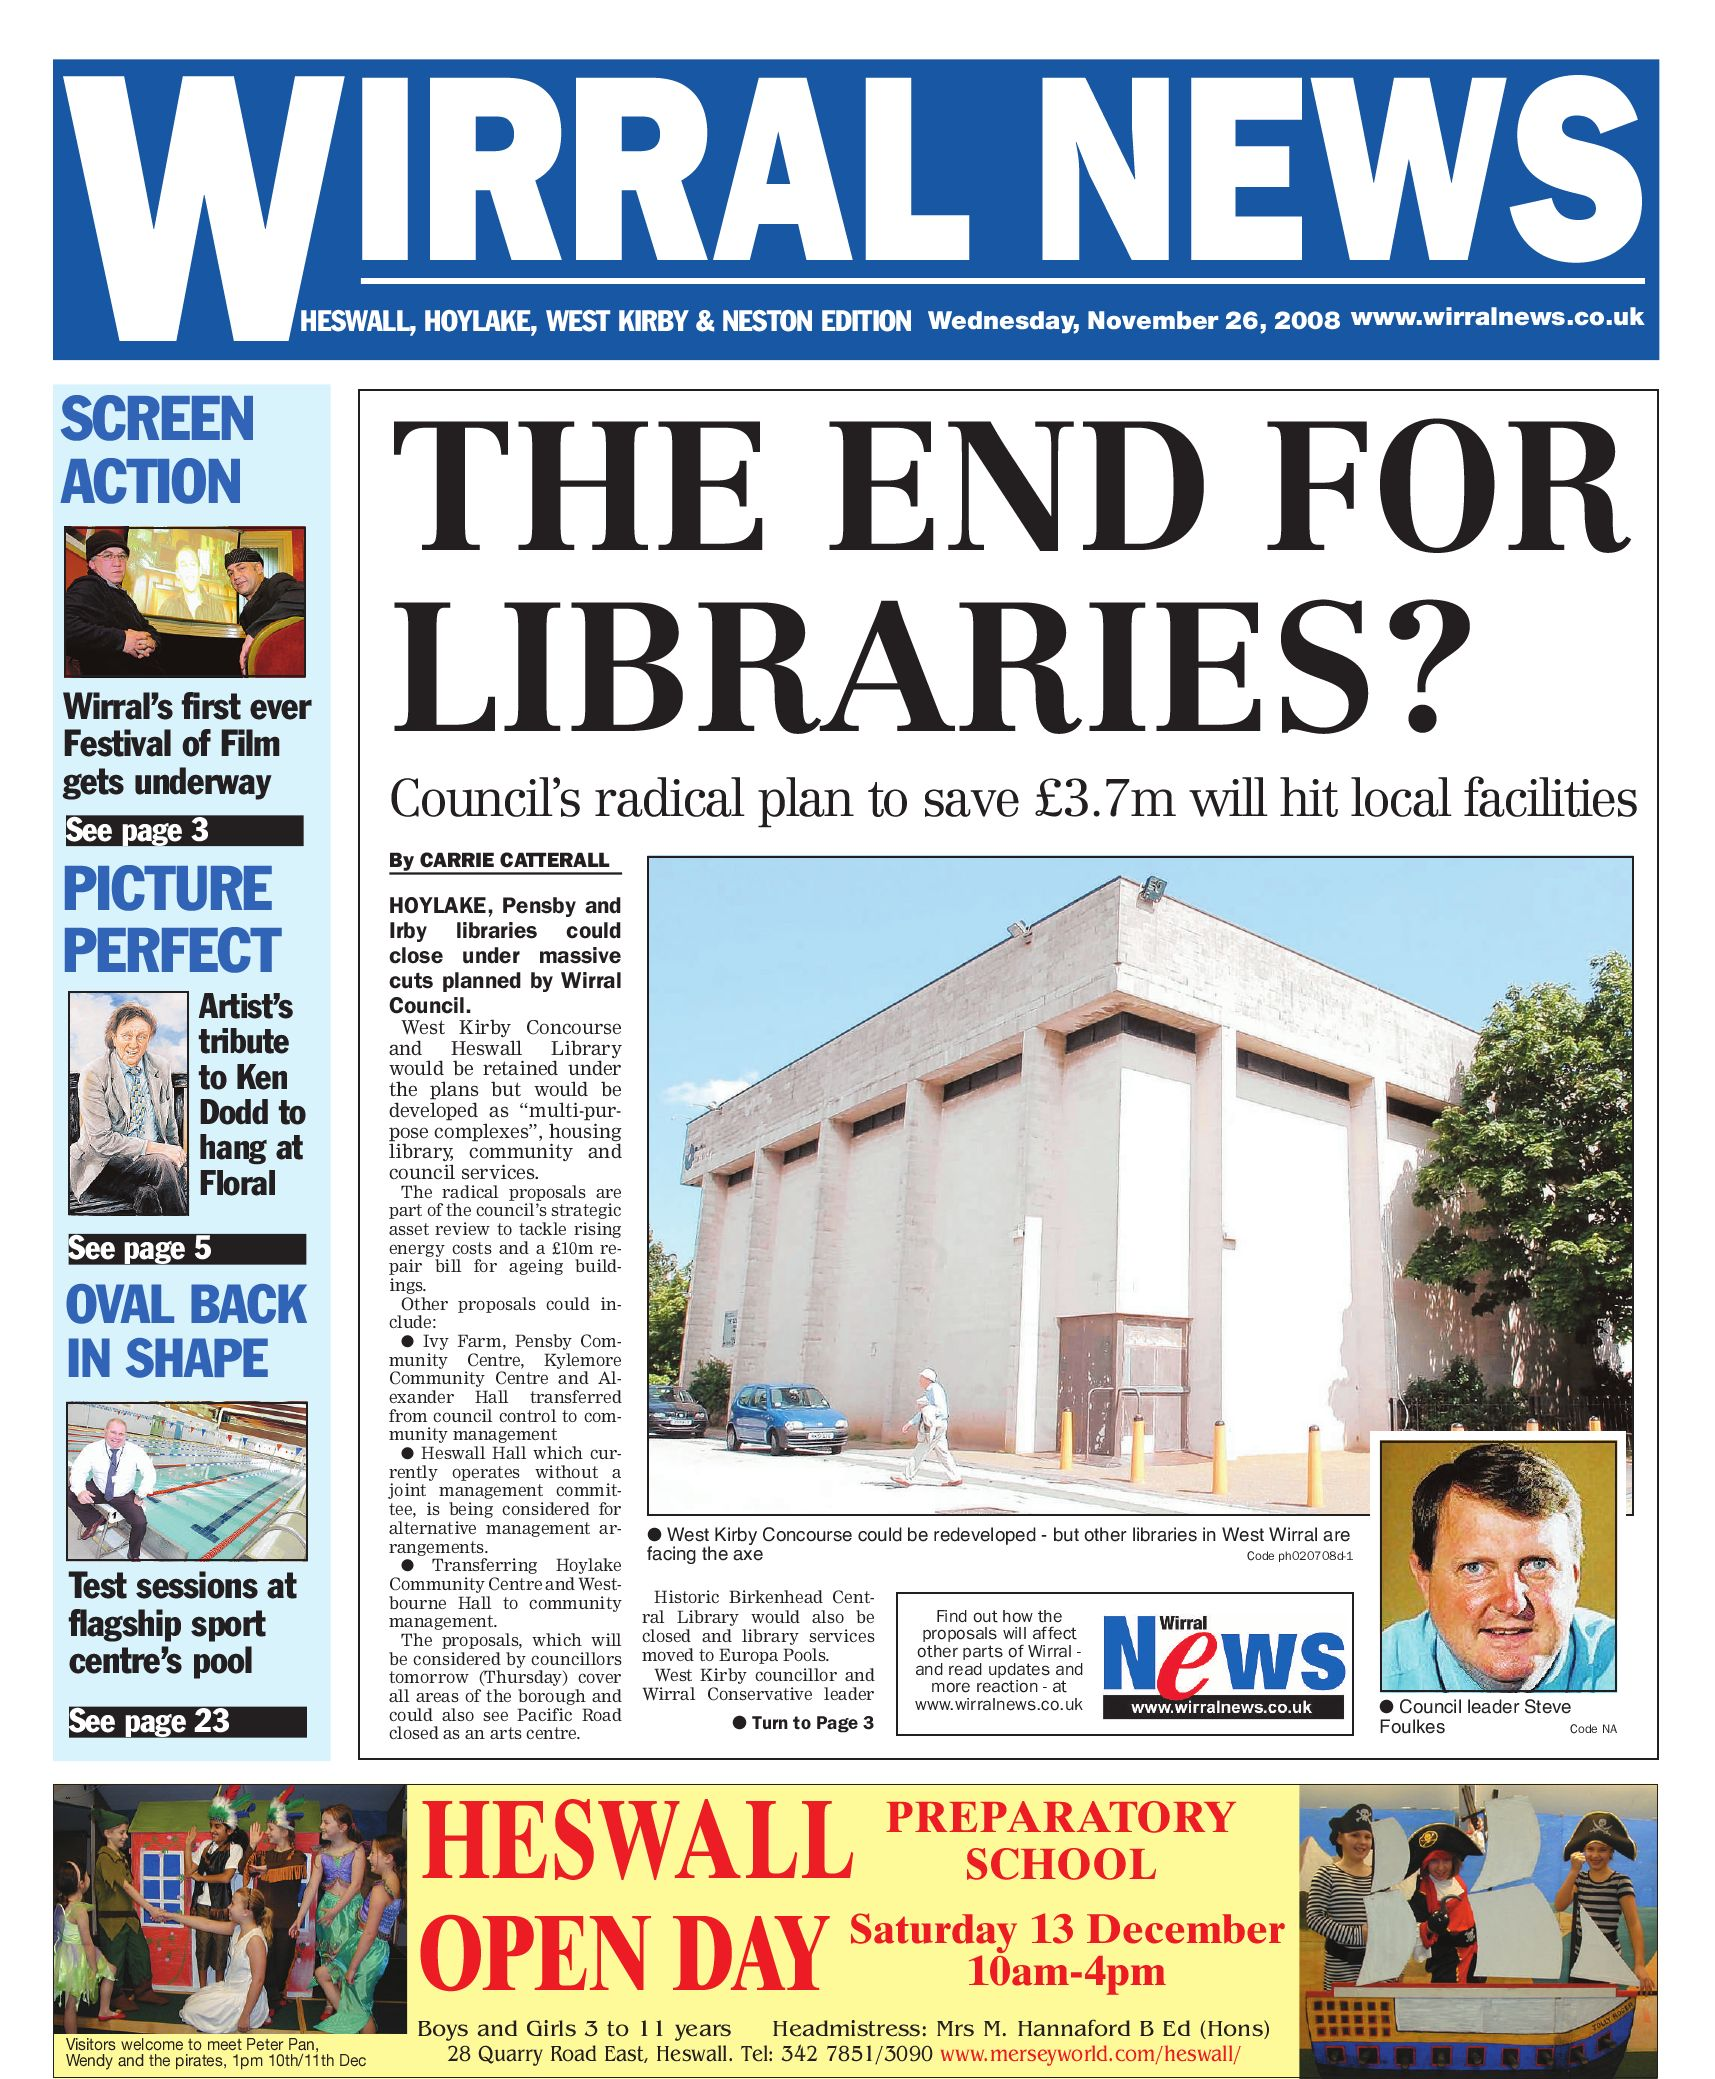 97b4a74e6c Wirral News - West Wallasey Edition by Merseyside.Weeklies v1s1ter - issuu